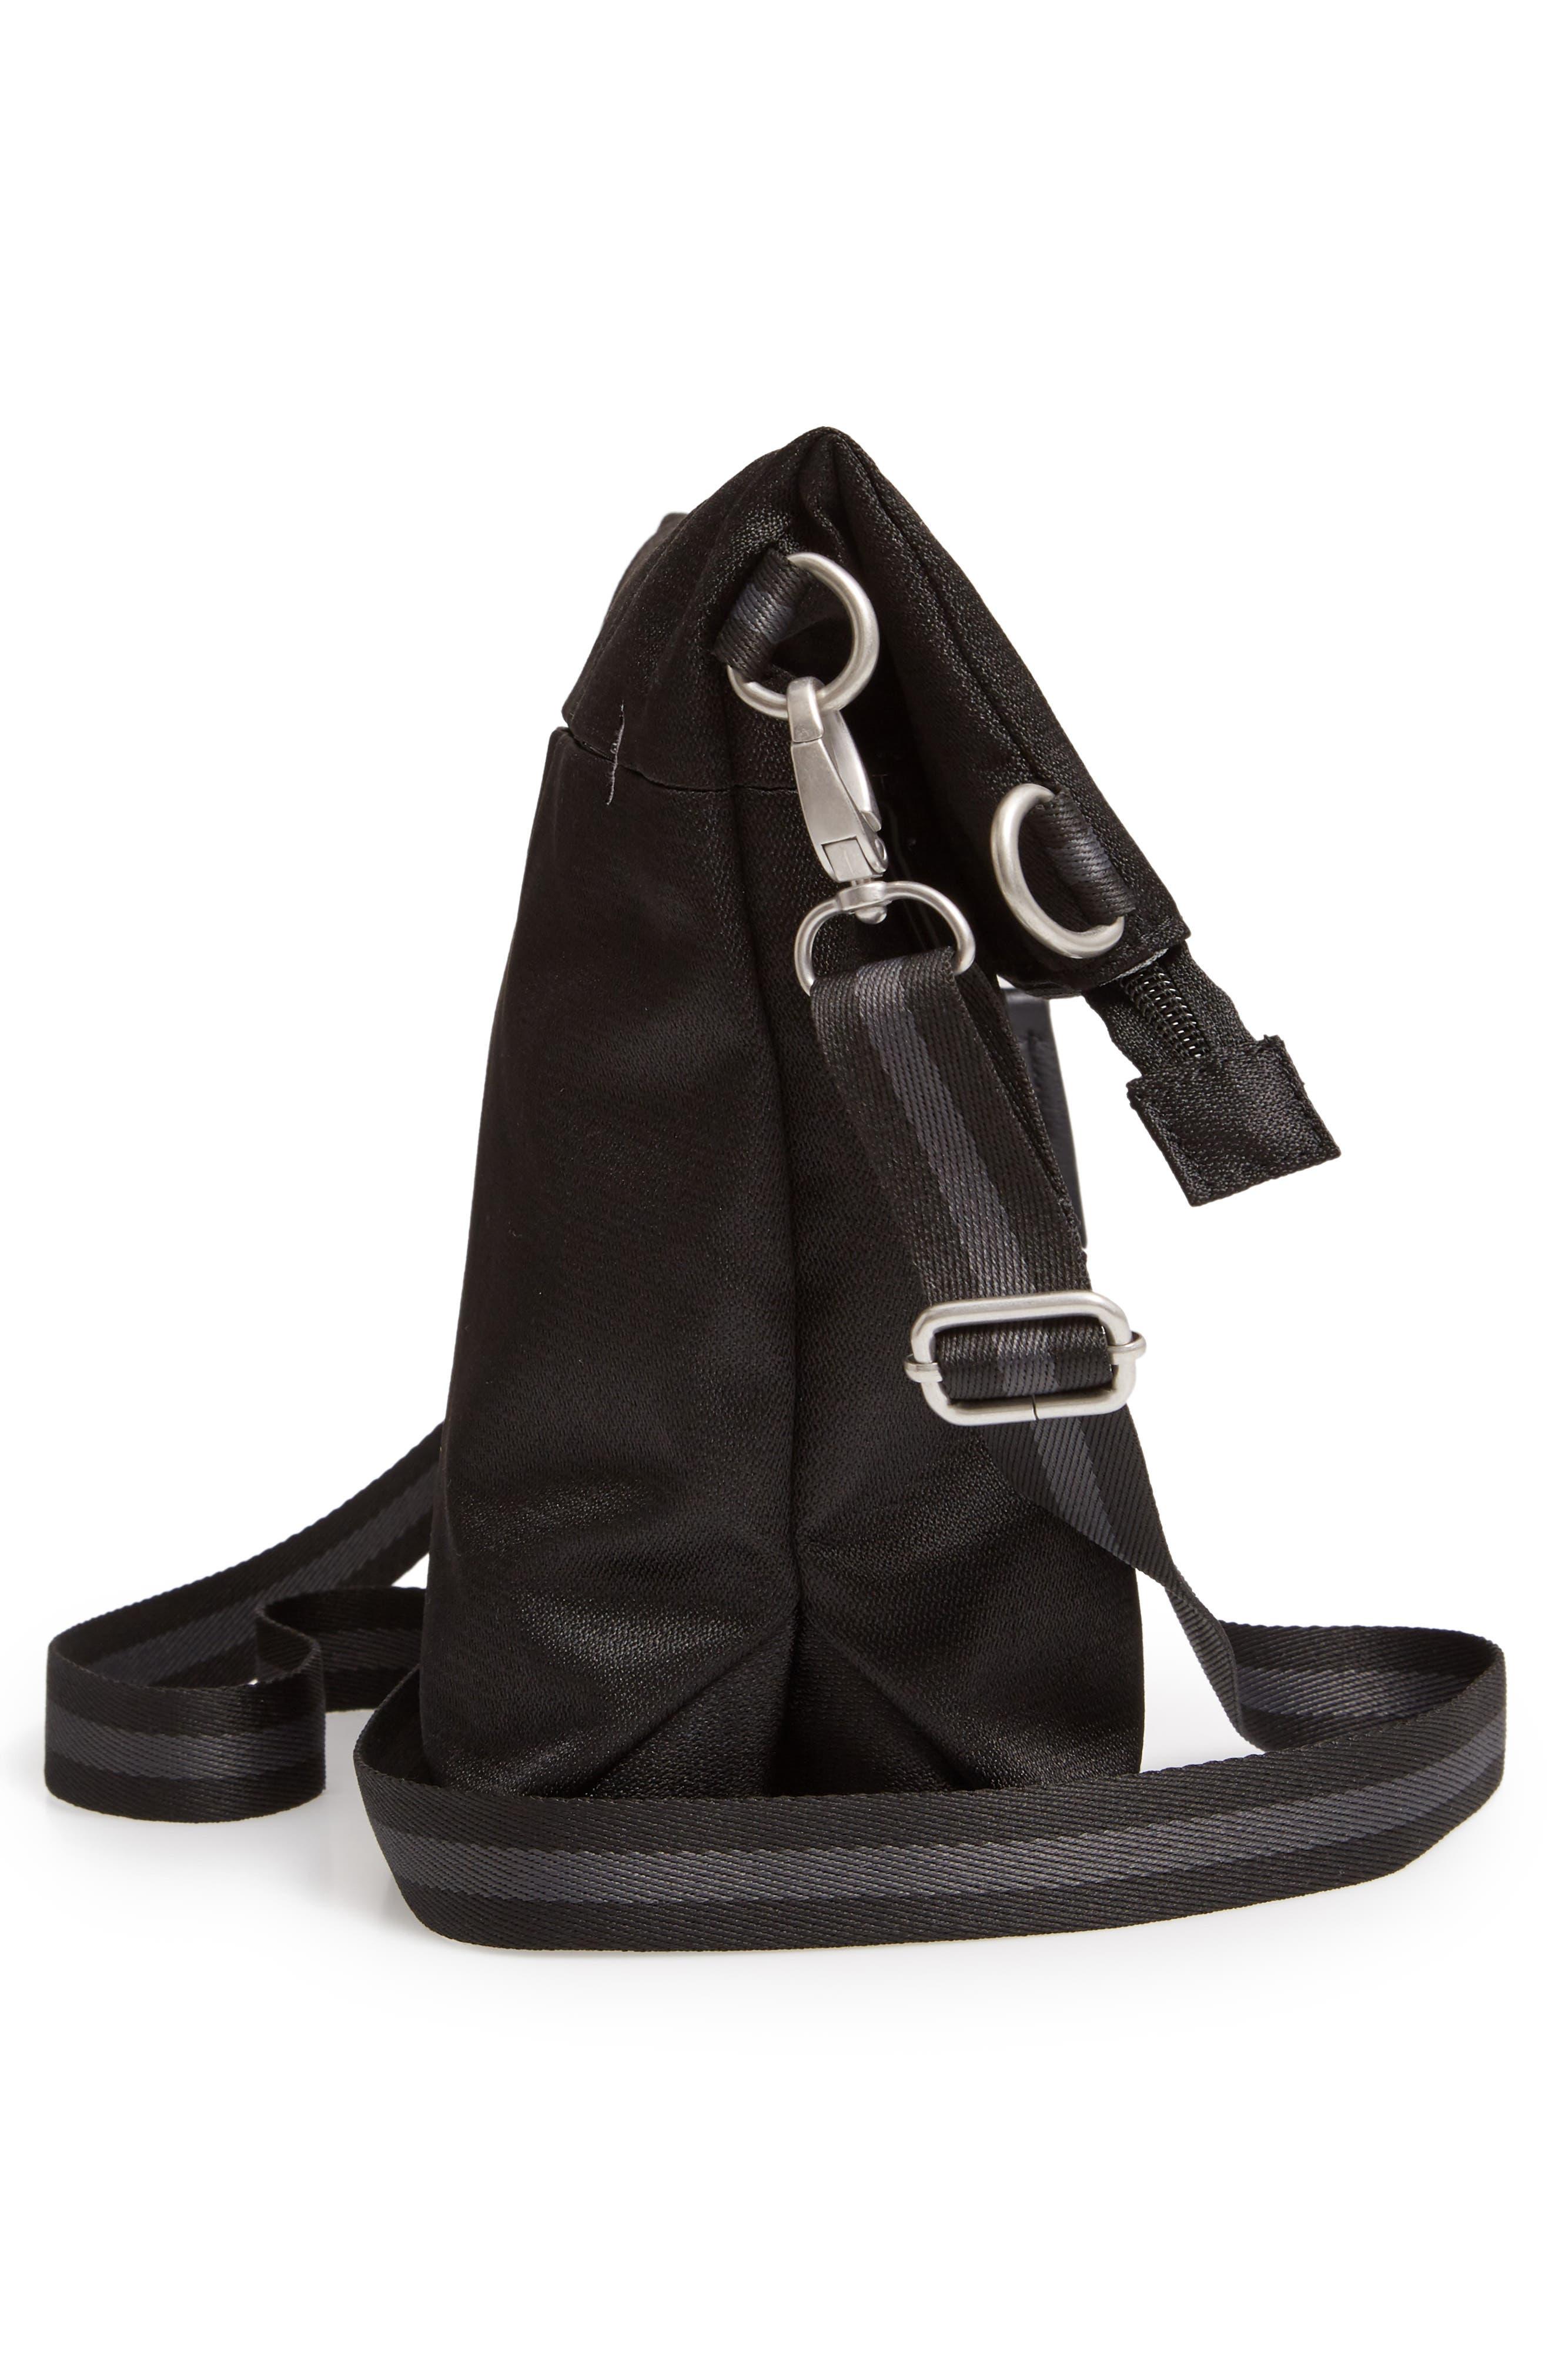 Vale RFID Crossbody Bag,                             Alternate thumbnail 6, color,                             BLACK/ BLACK